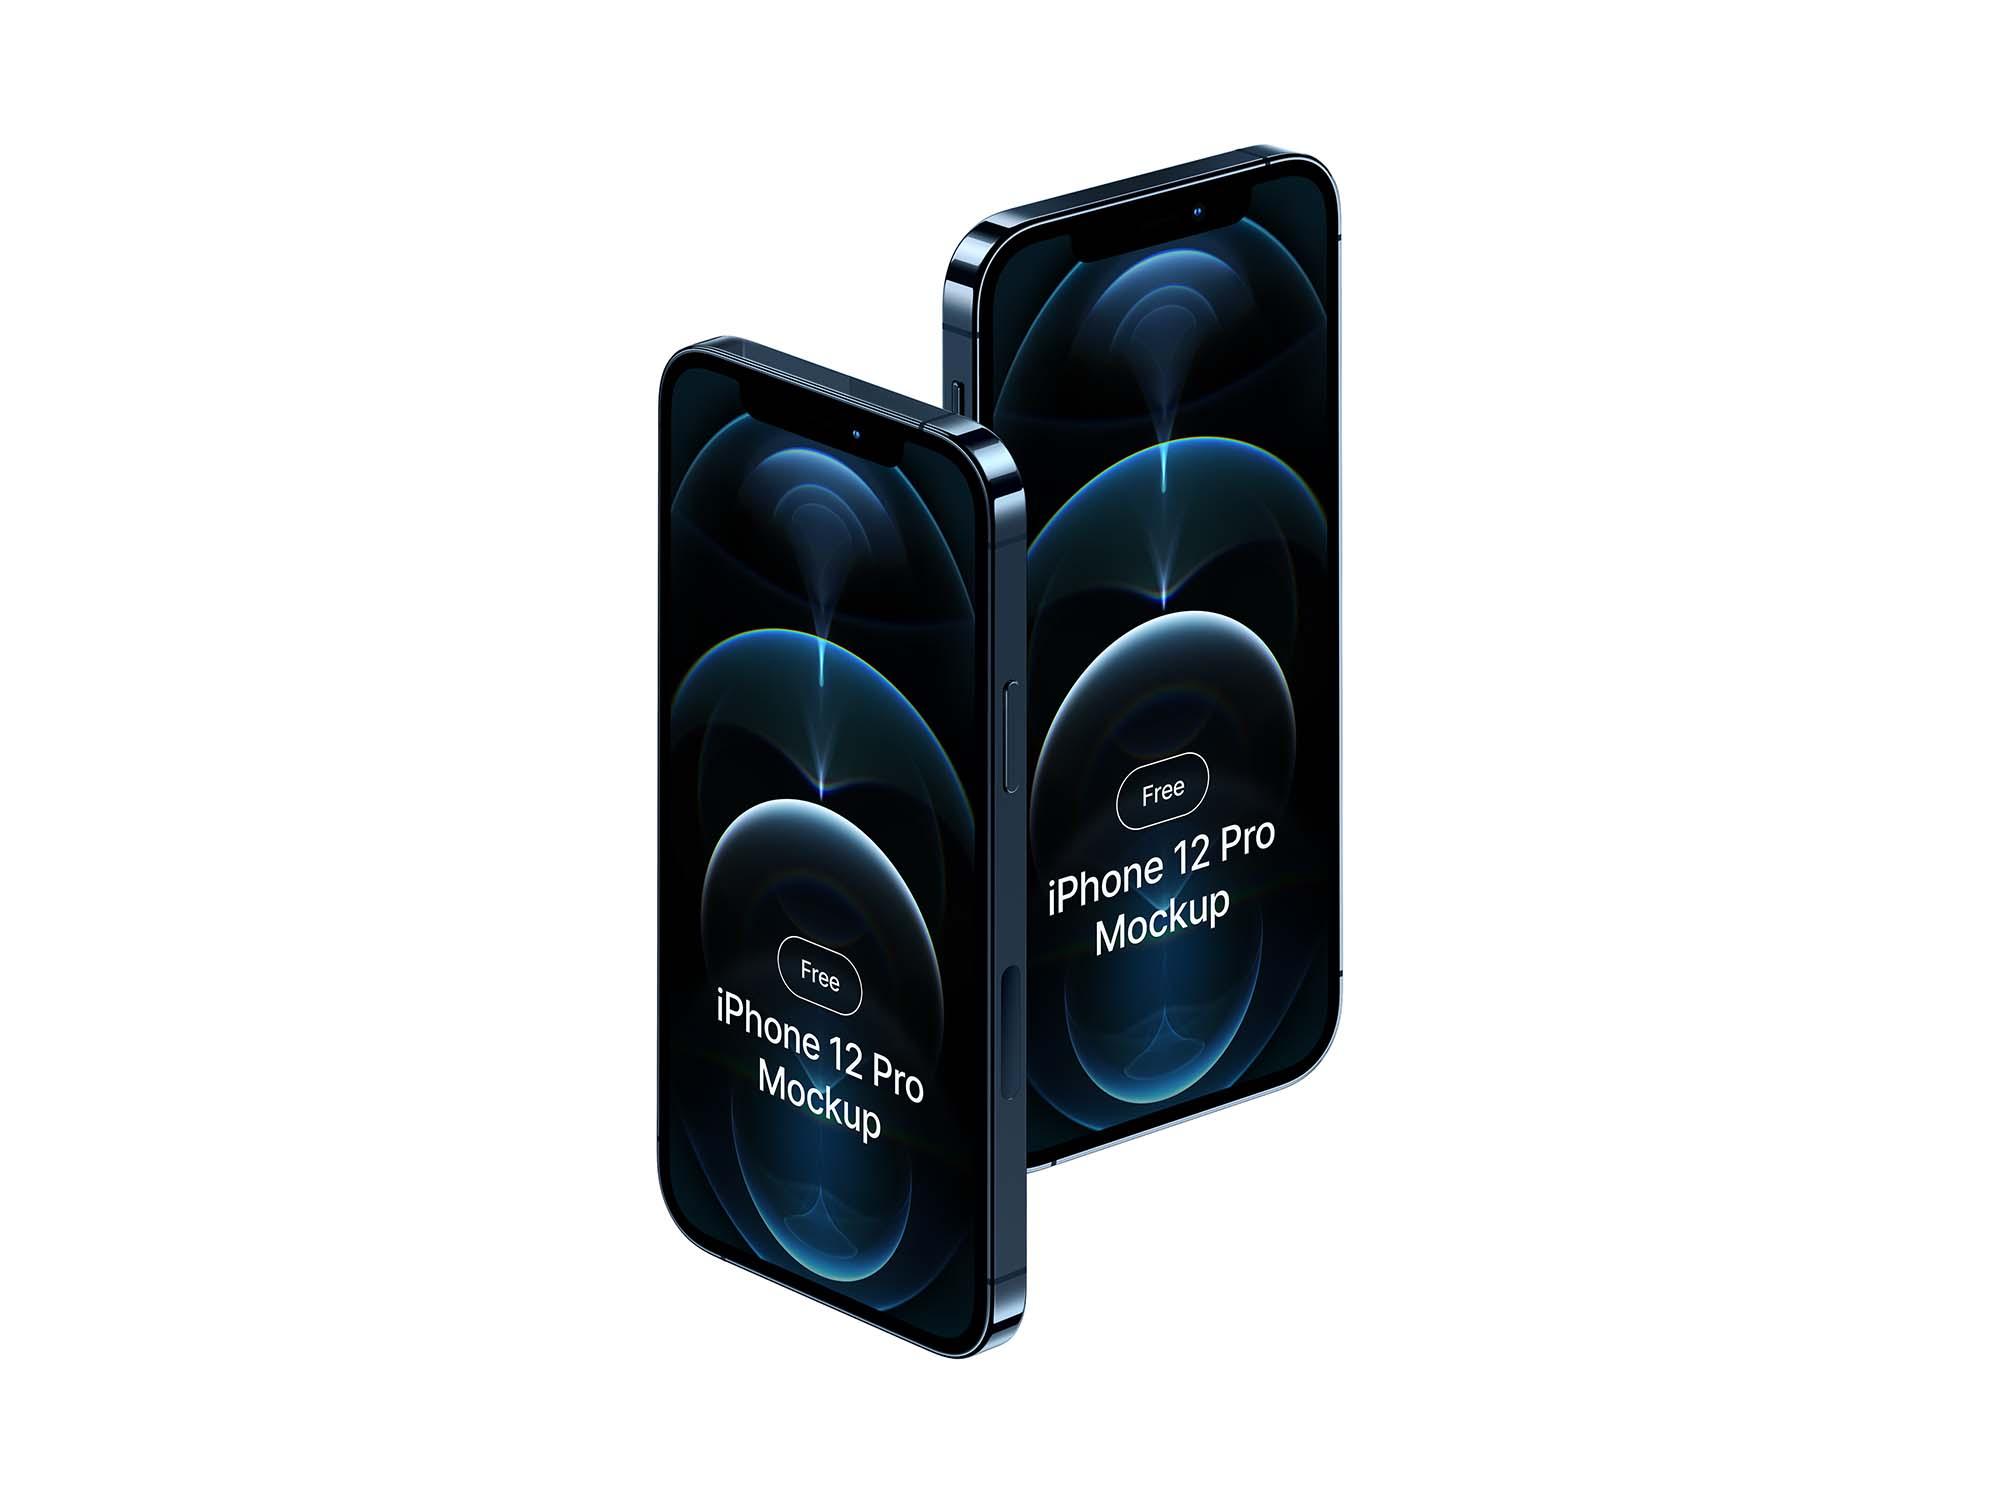 iPhone 12 Pro Mockup 3